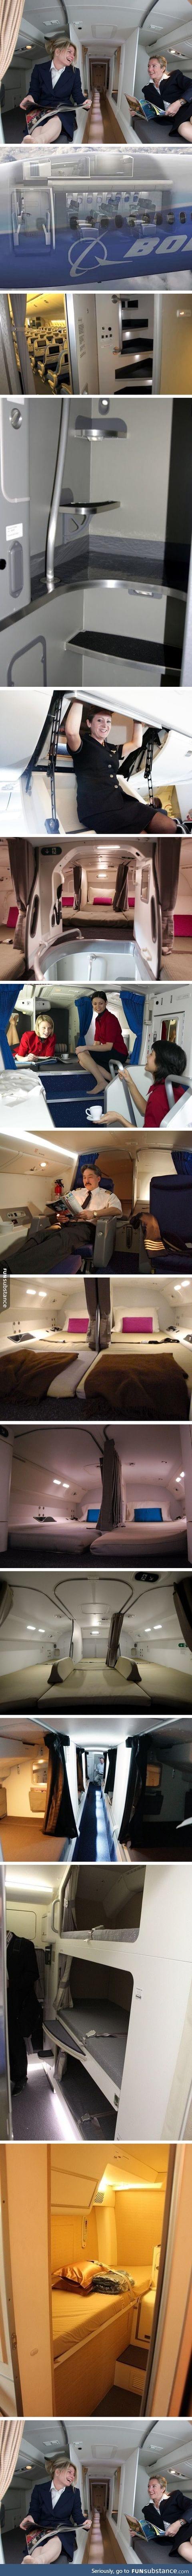 Secret Cabins Flight Attendants Sleep In During Long Haul Flights